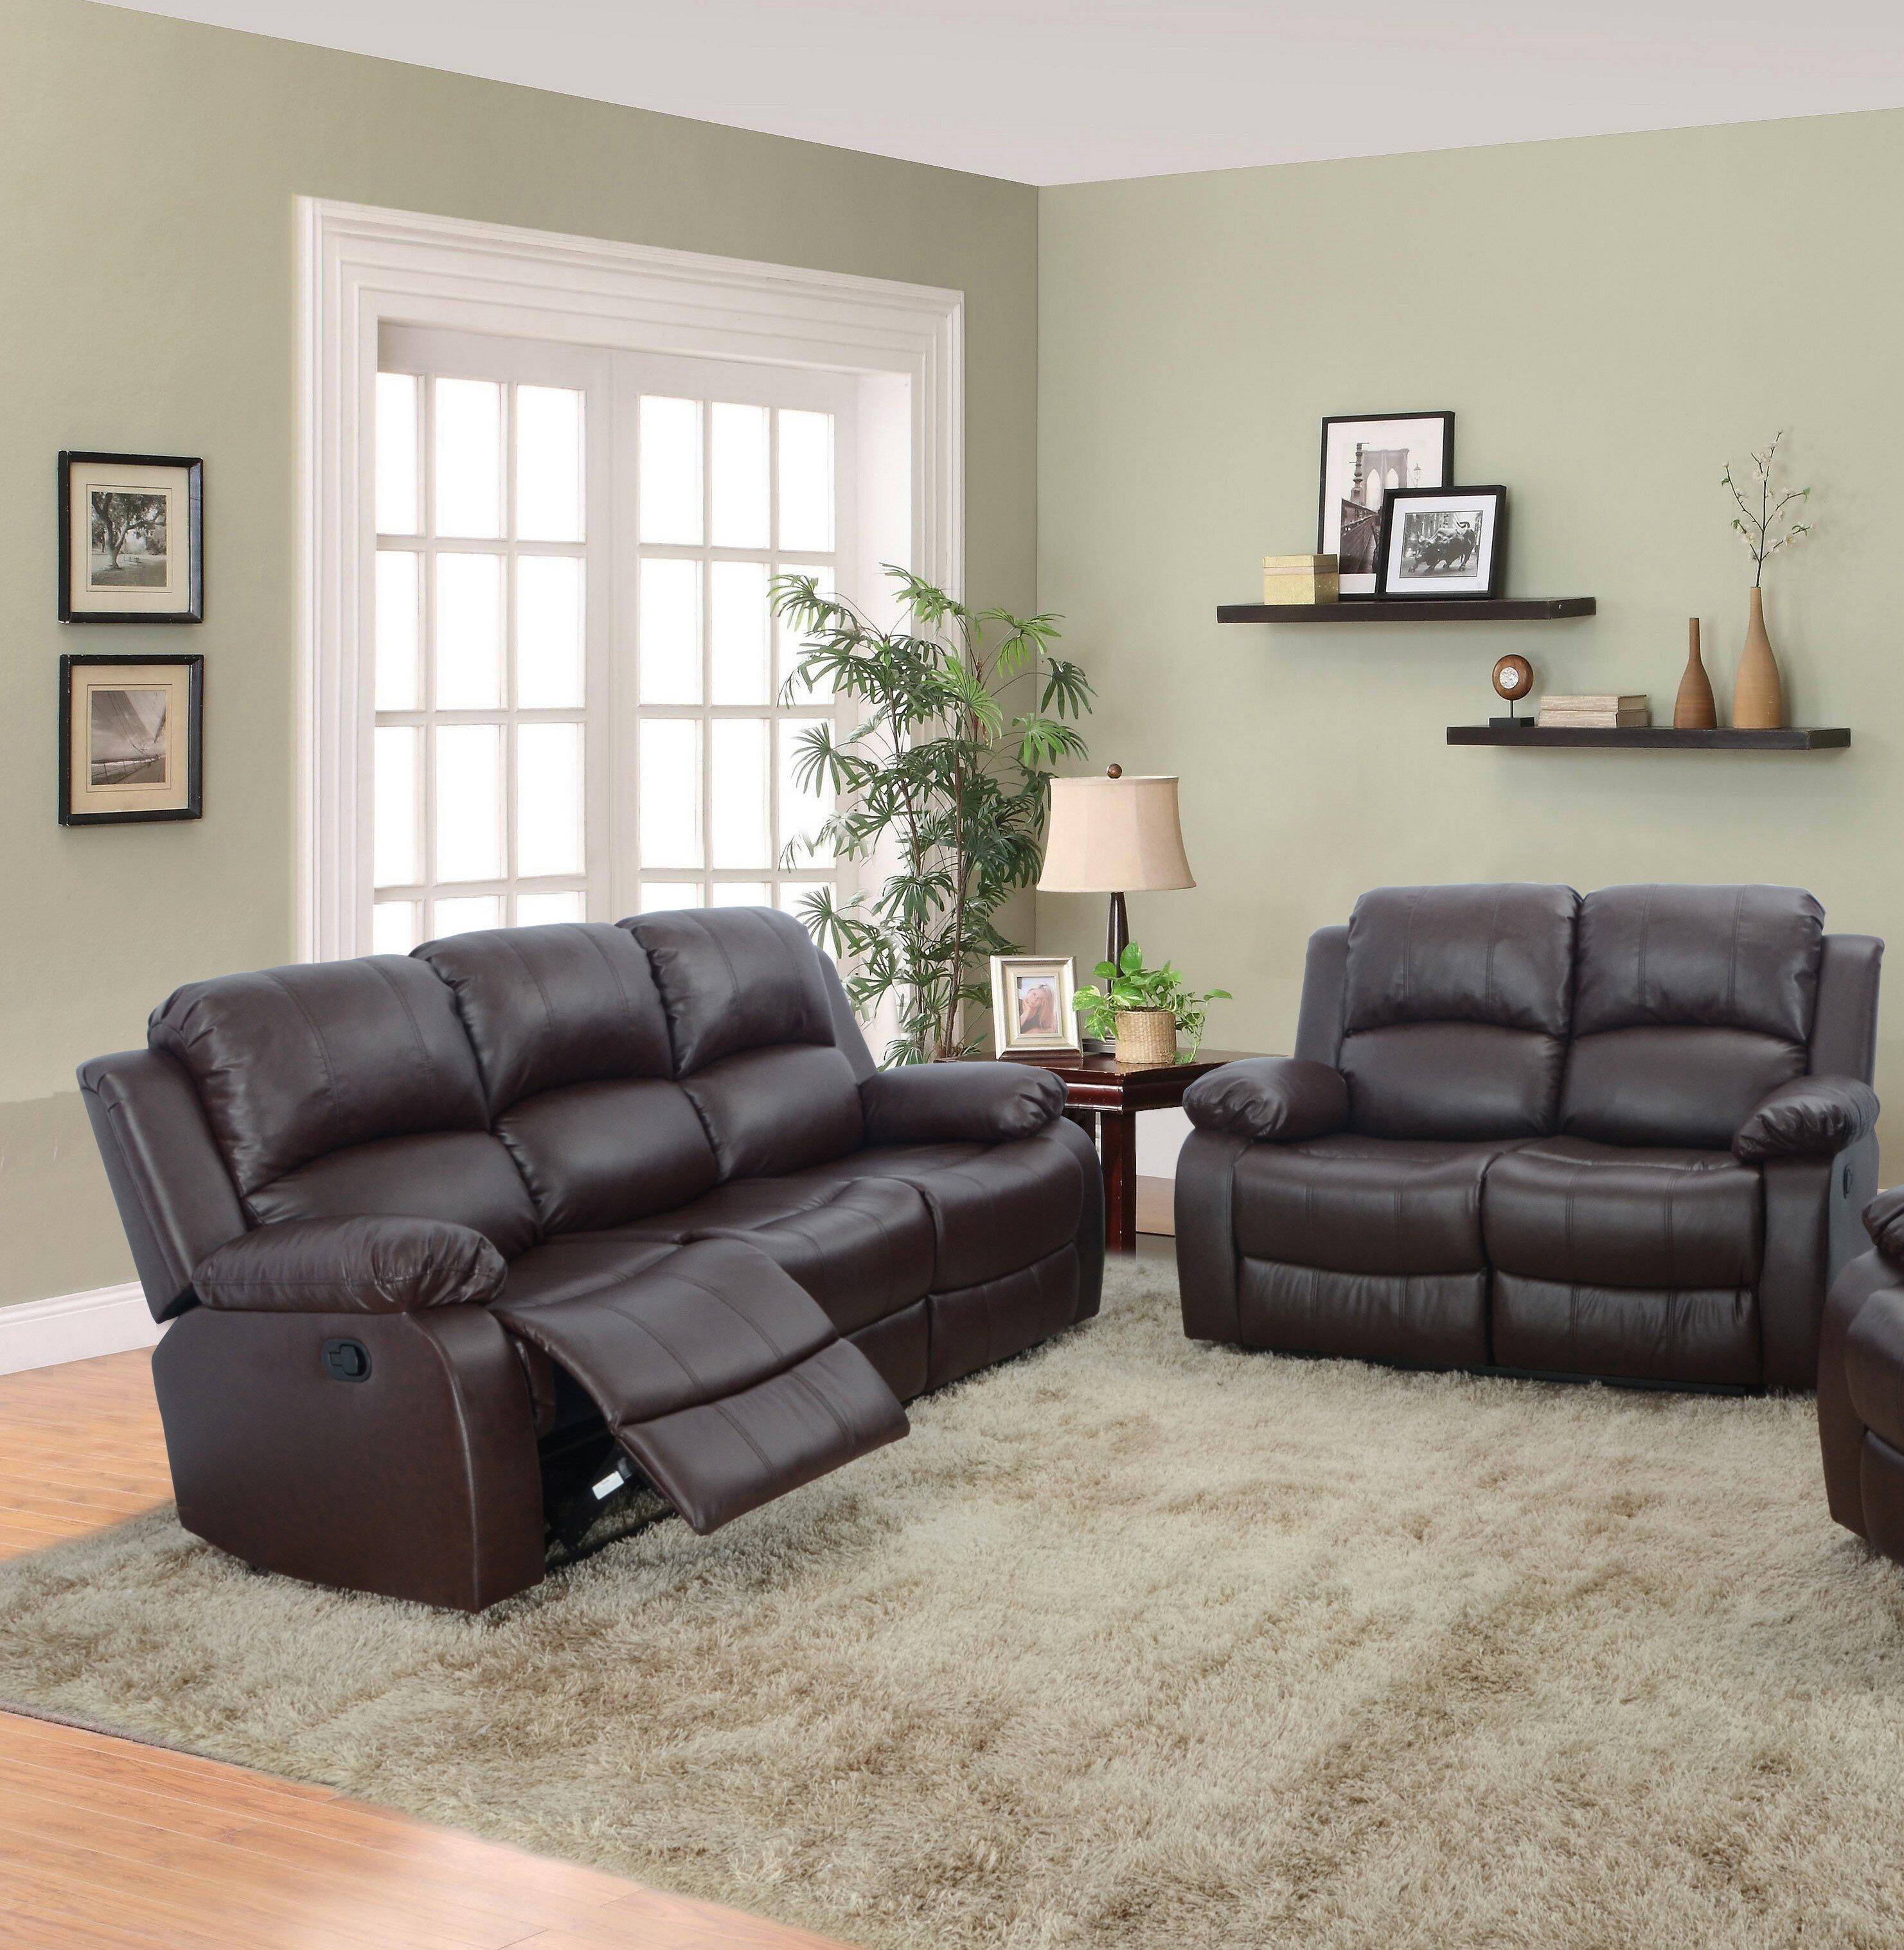 Red Barrel Studio Hartranft 2 Piece Faux Leather Reclining Living Room Set Reviews Wayfair